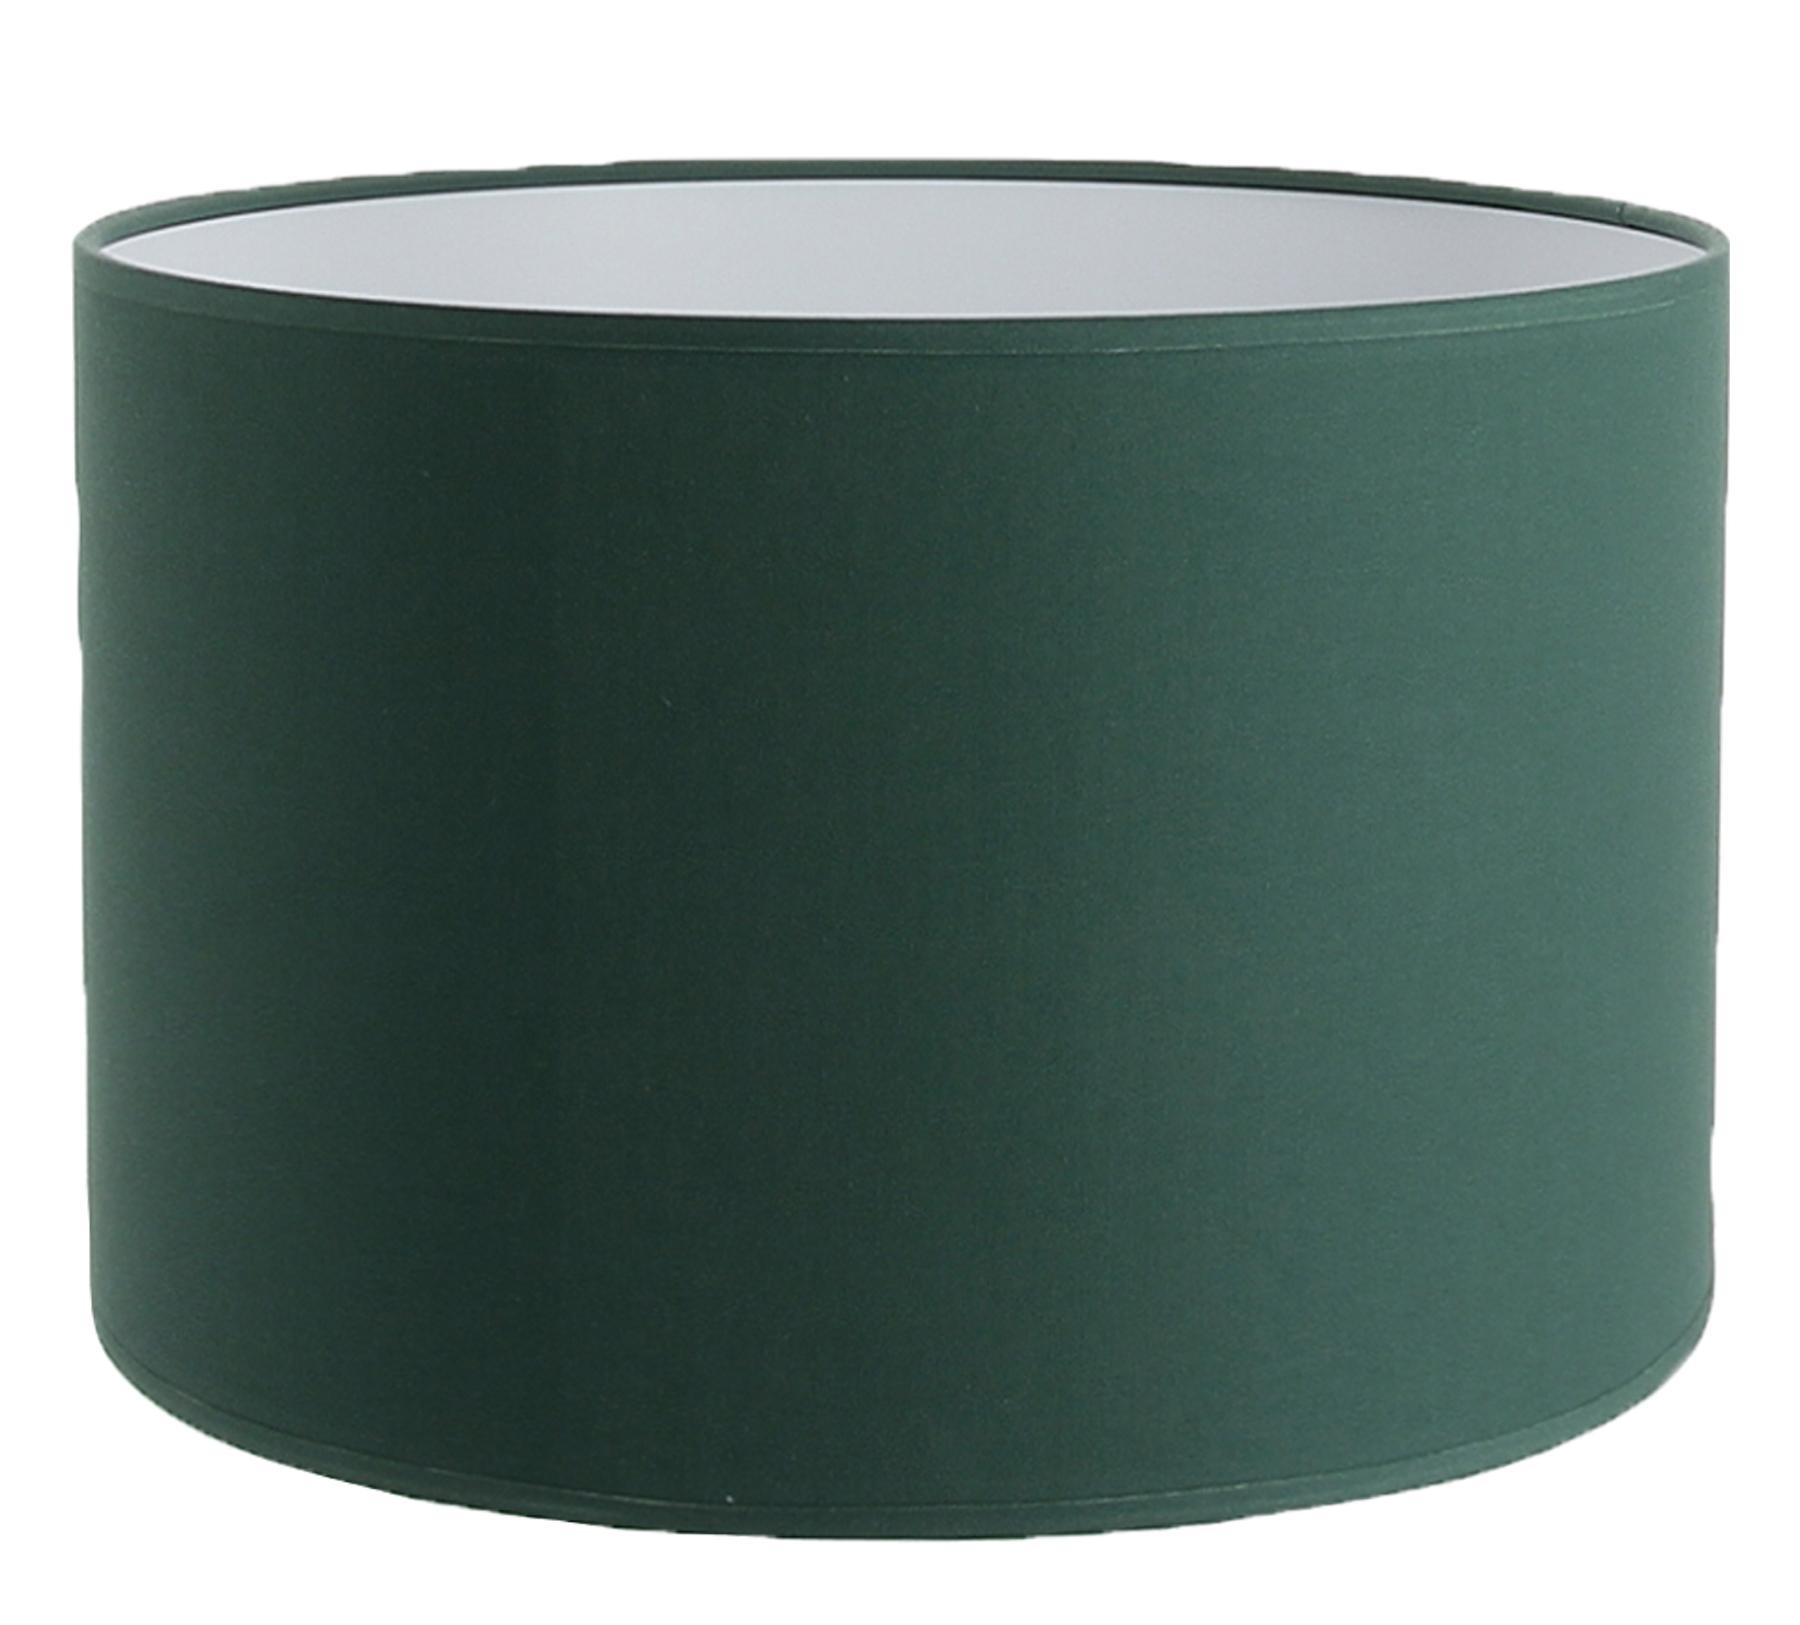 Abat-jour cylindre vert tropique